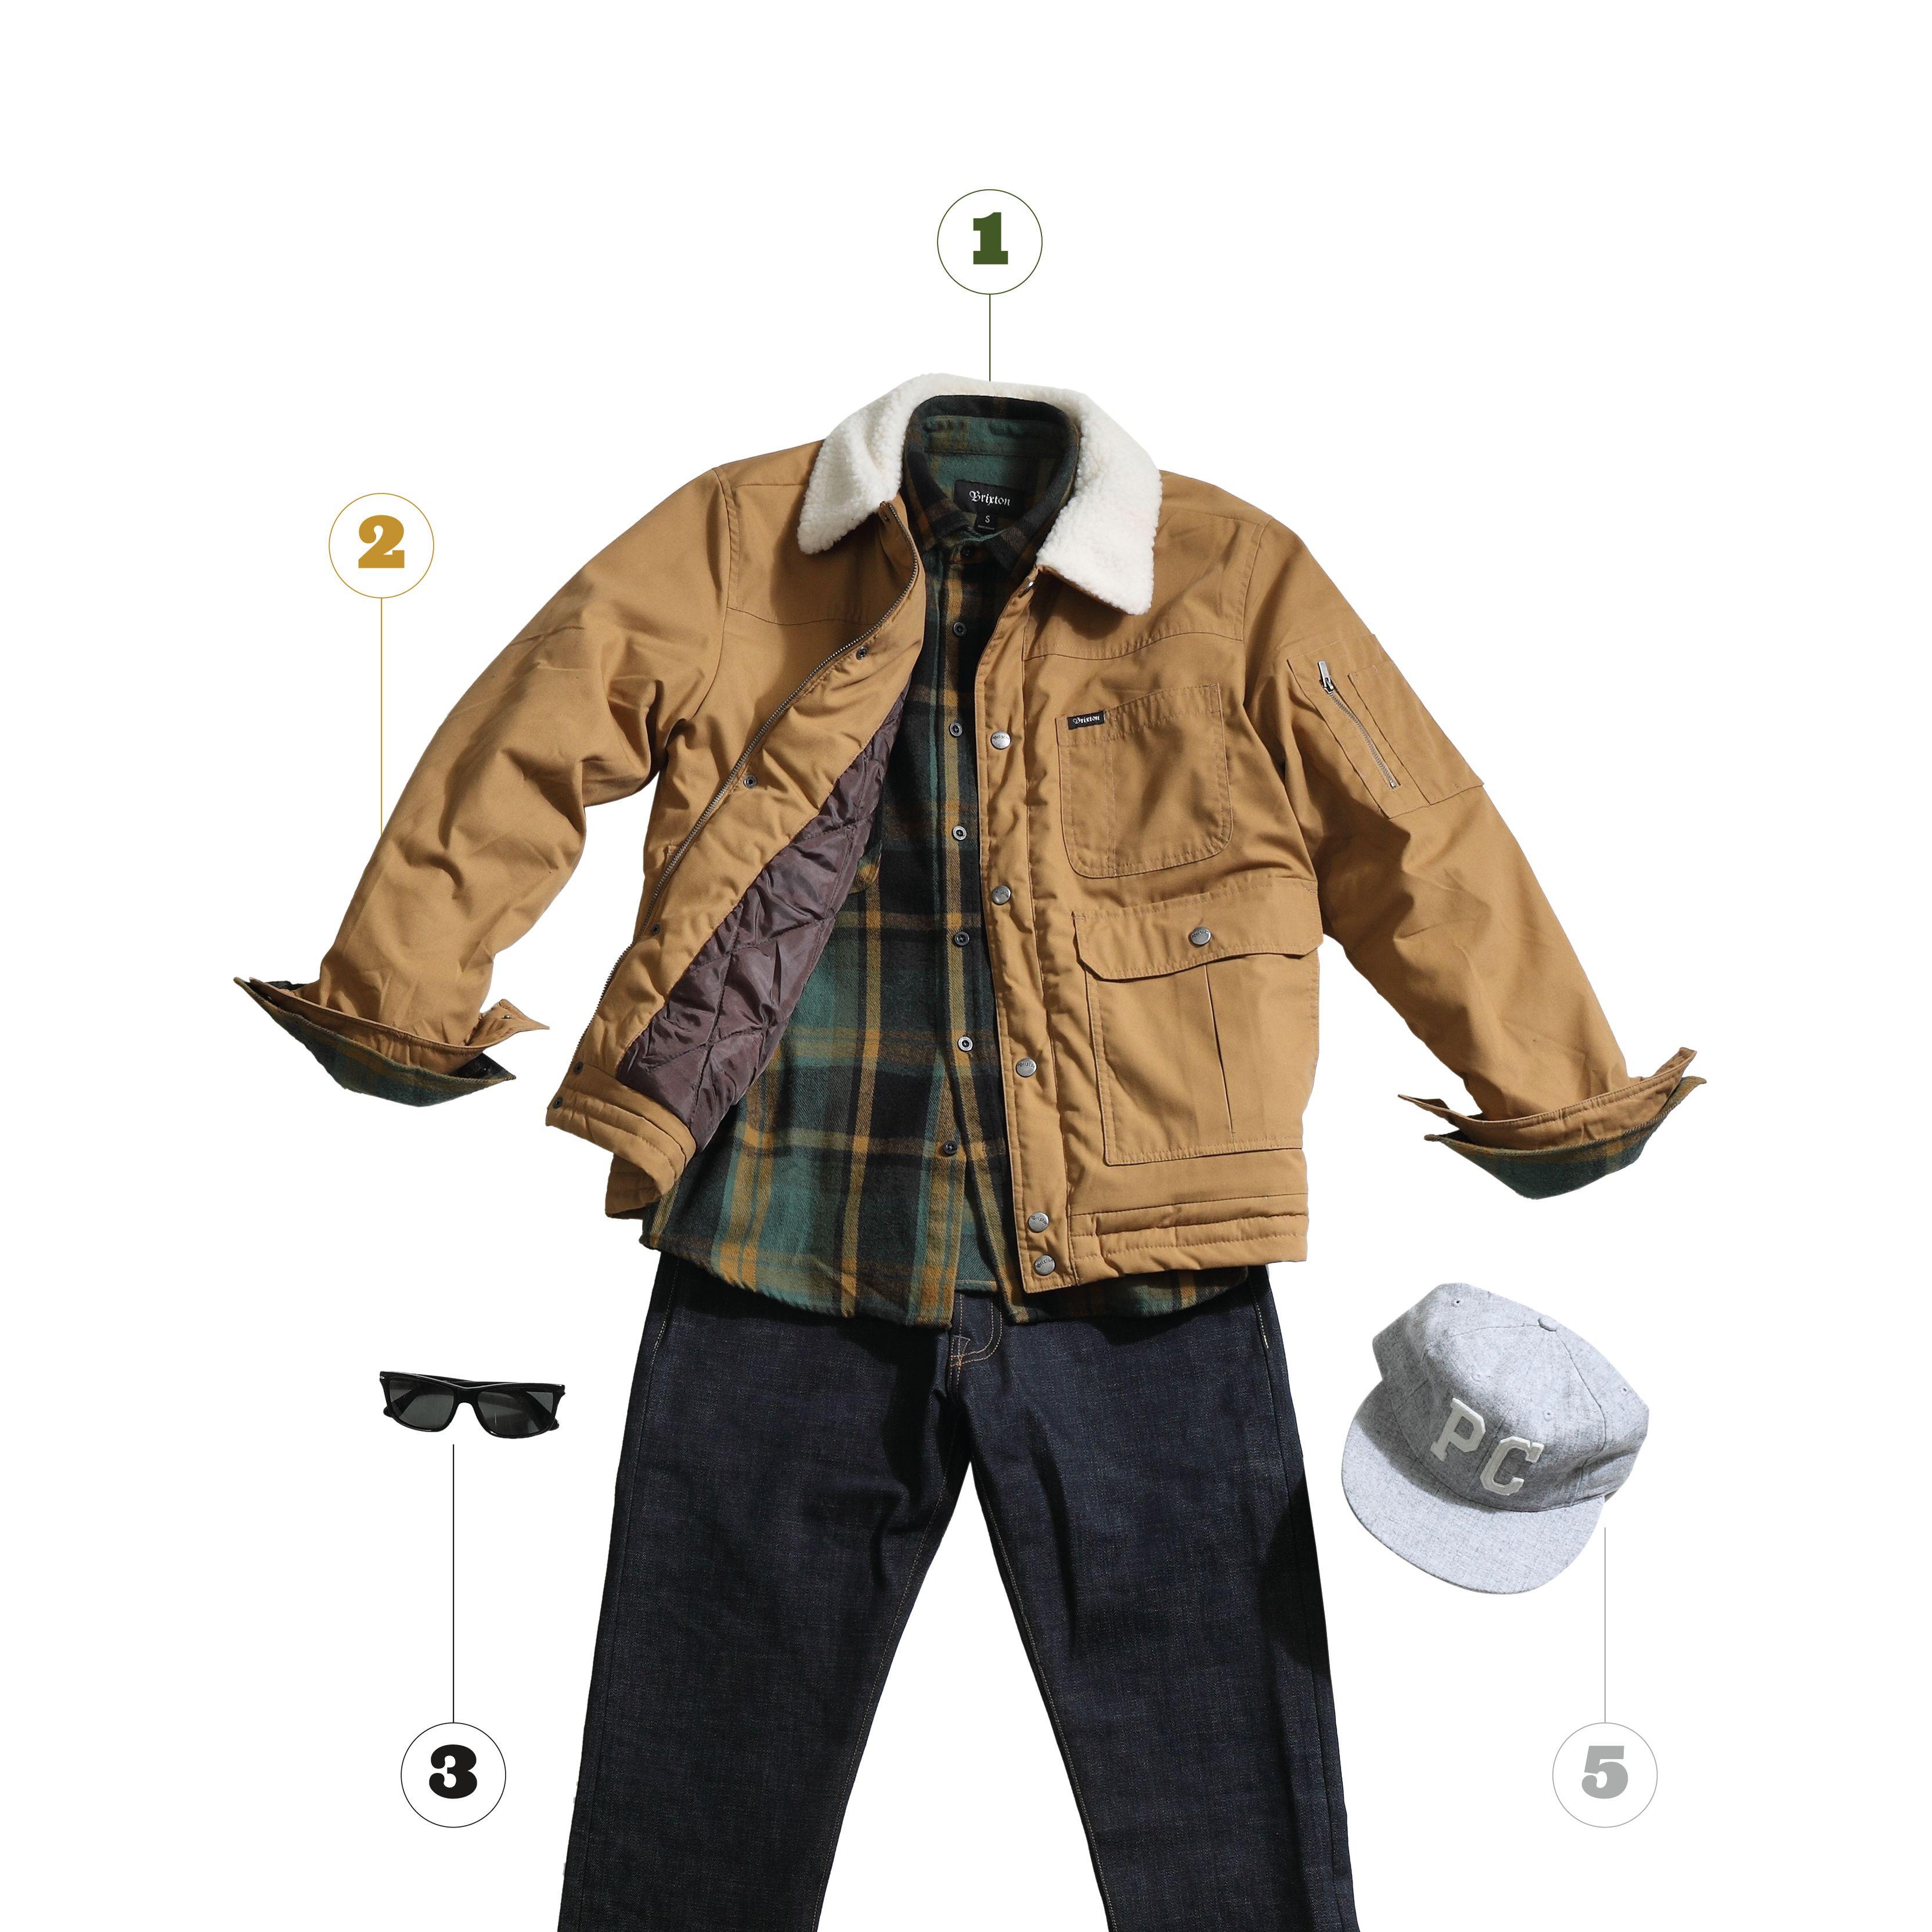 Pcwi 16 wardrobe sundance kid zlkvi9